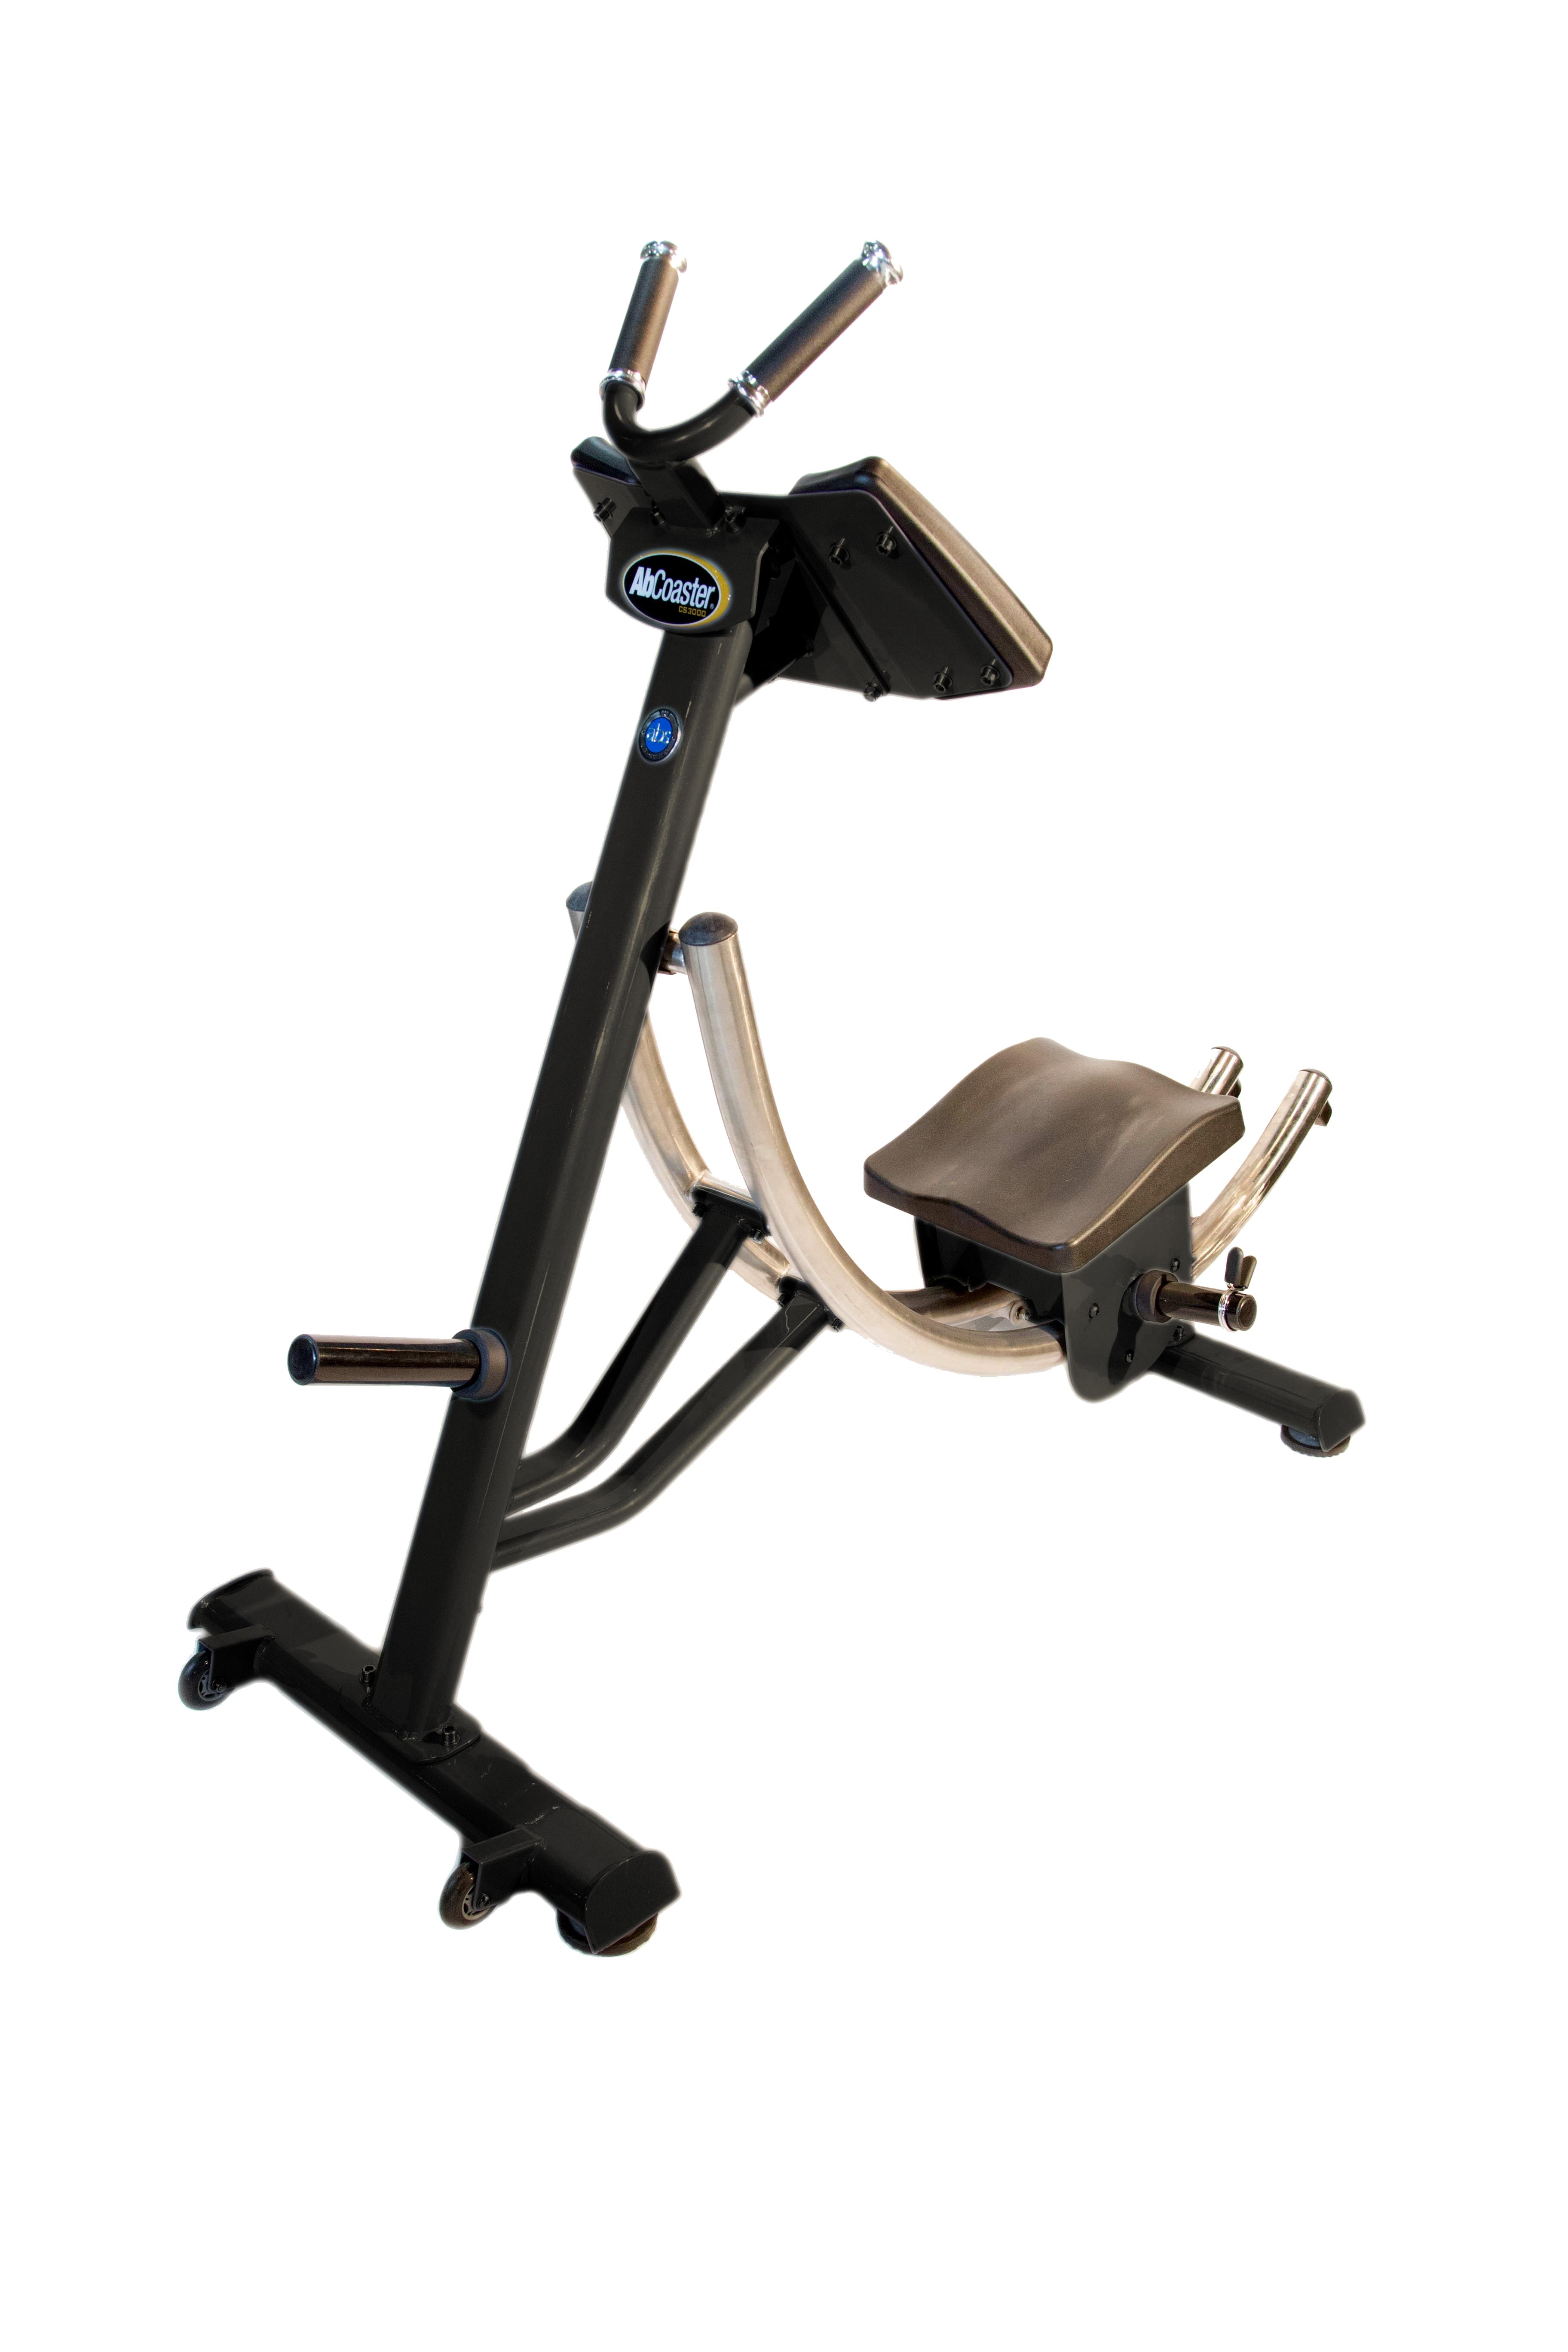 Ab Coaster CS 3000